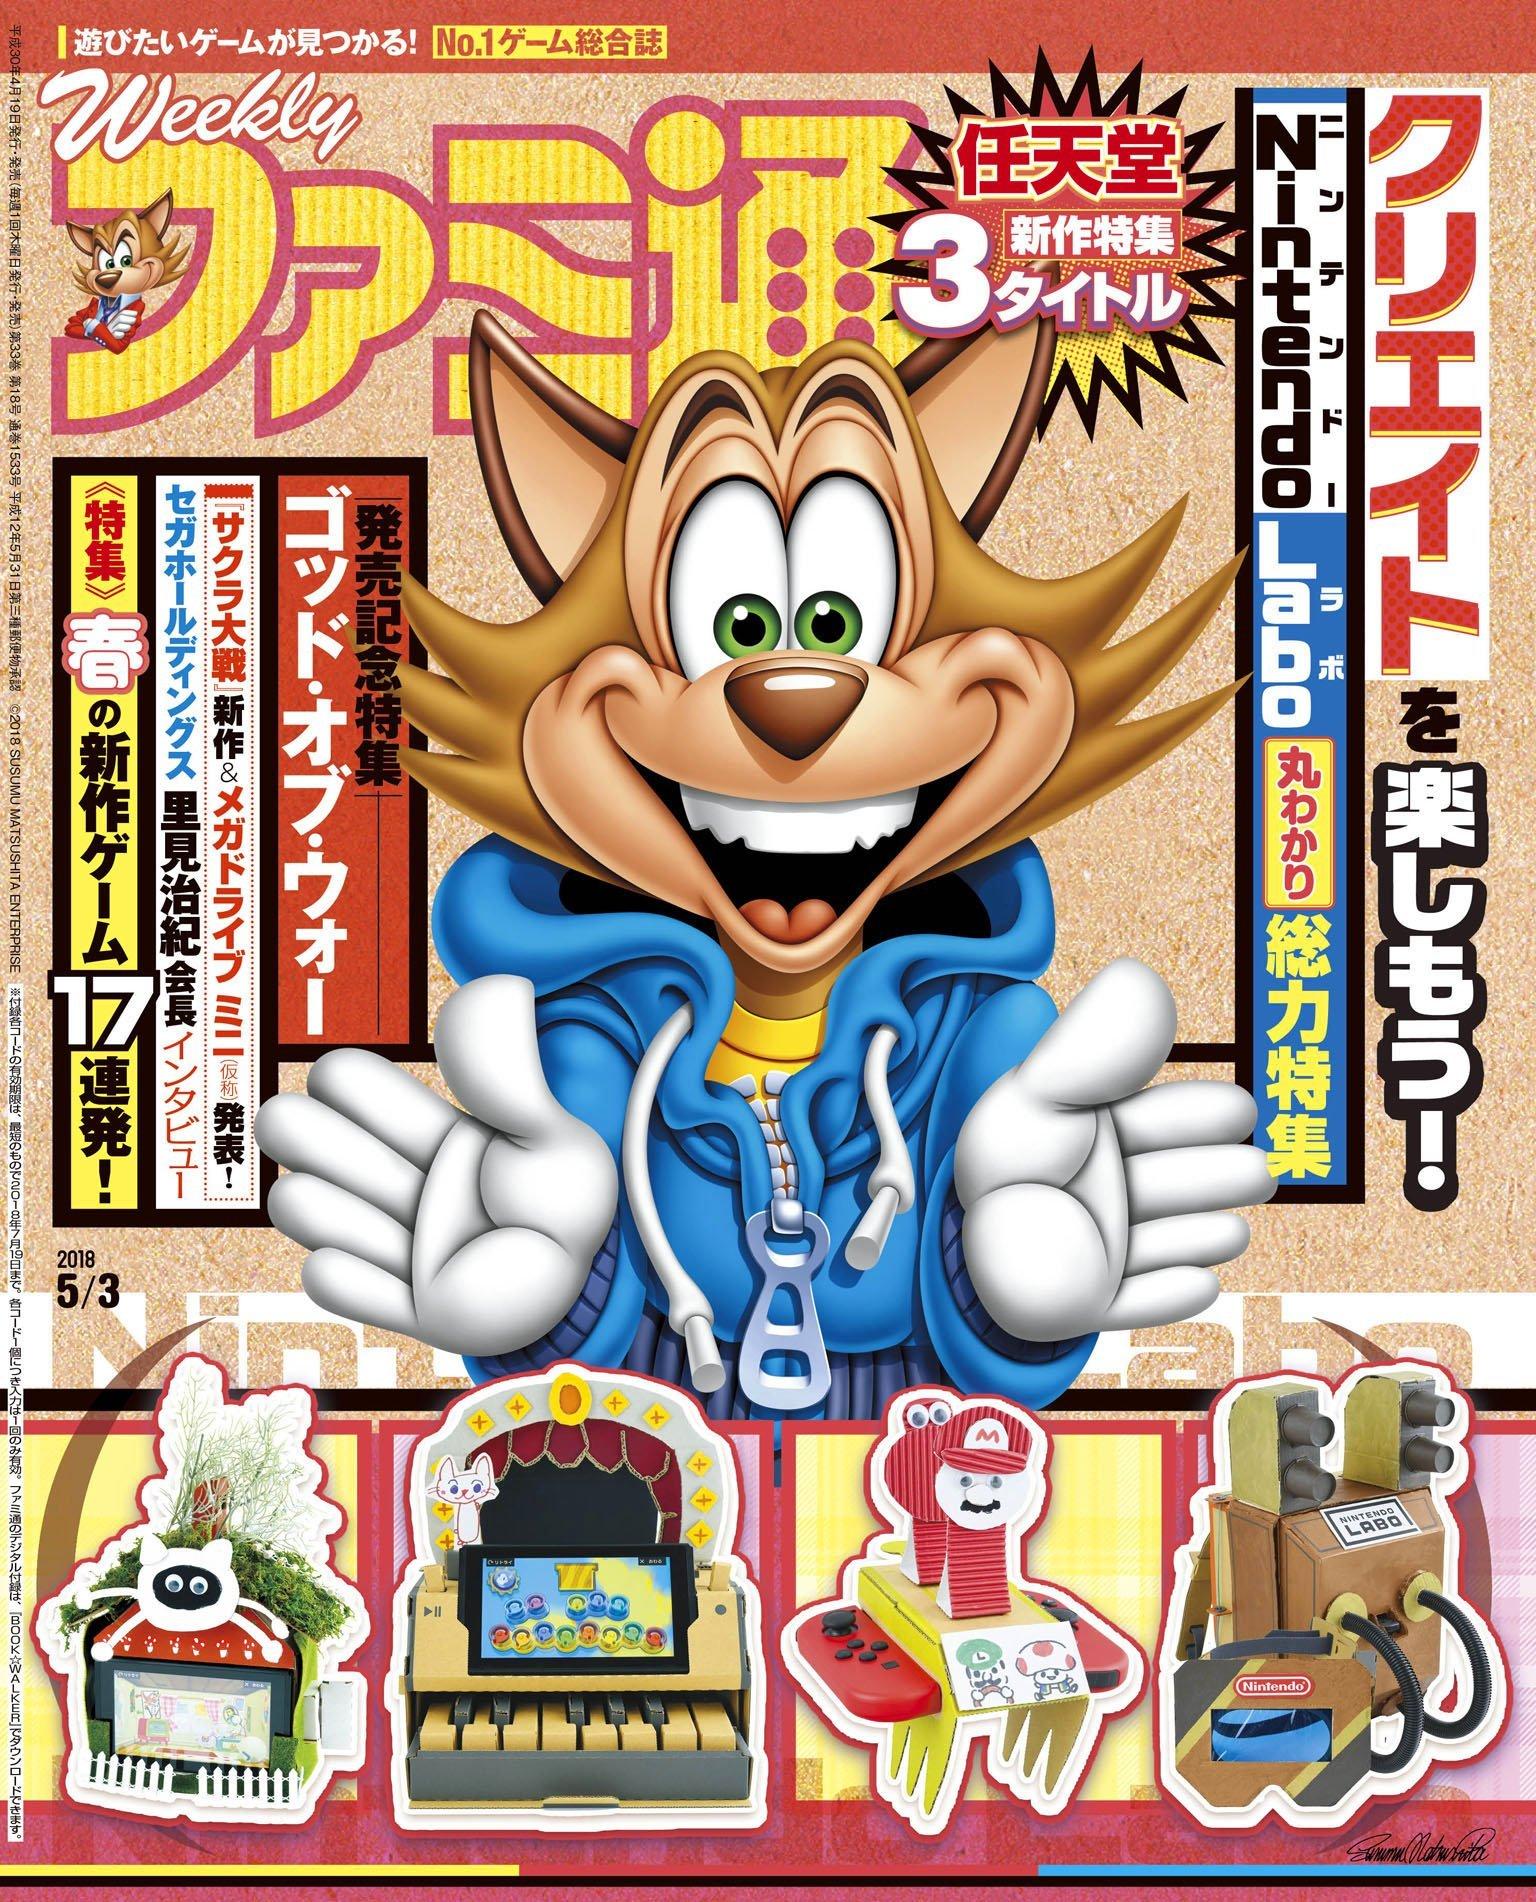 Famitsu 1533 (May 3, 2018)